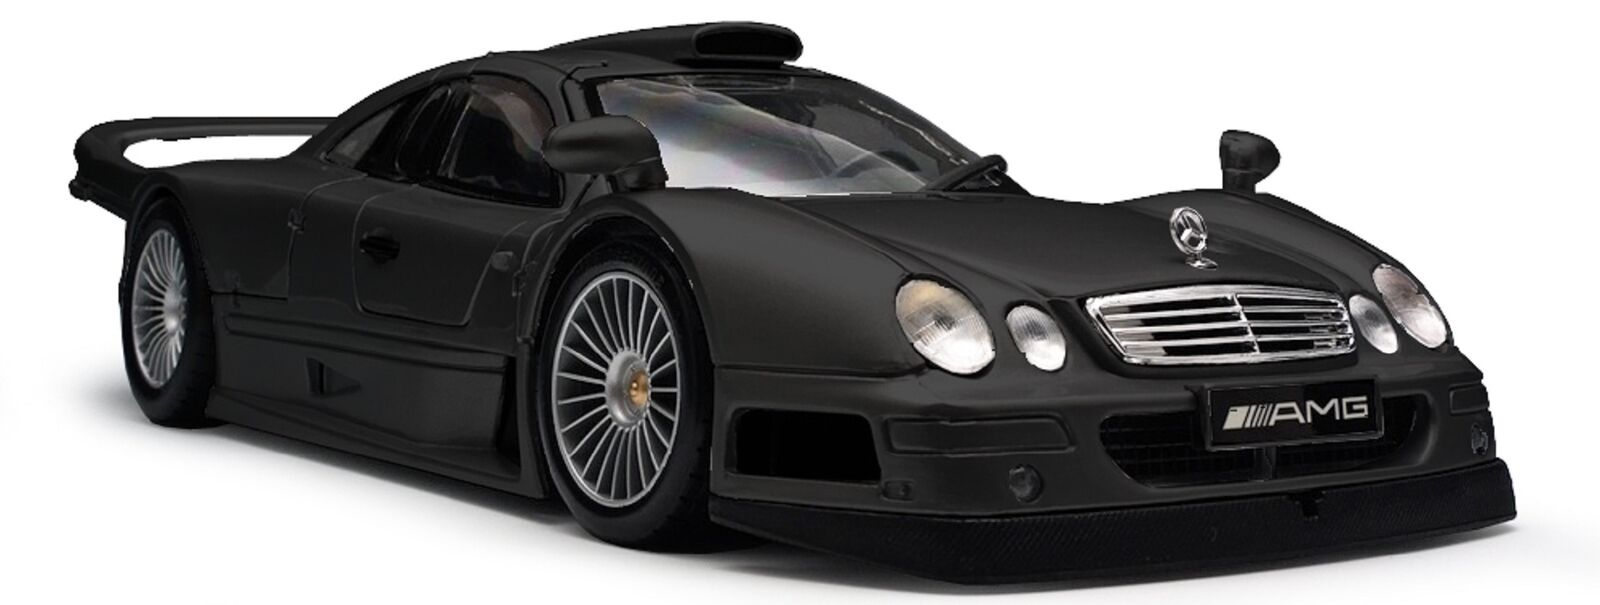 FORD Mustang Mercedes Benz CLK-GTR-Street versione nero opaco Maisto 1:18